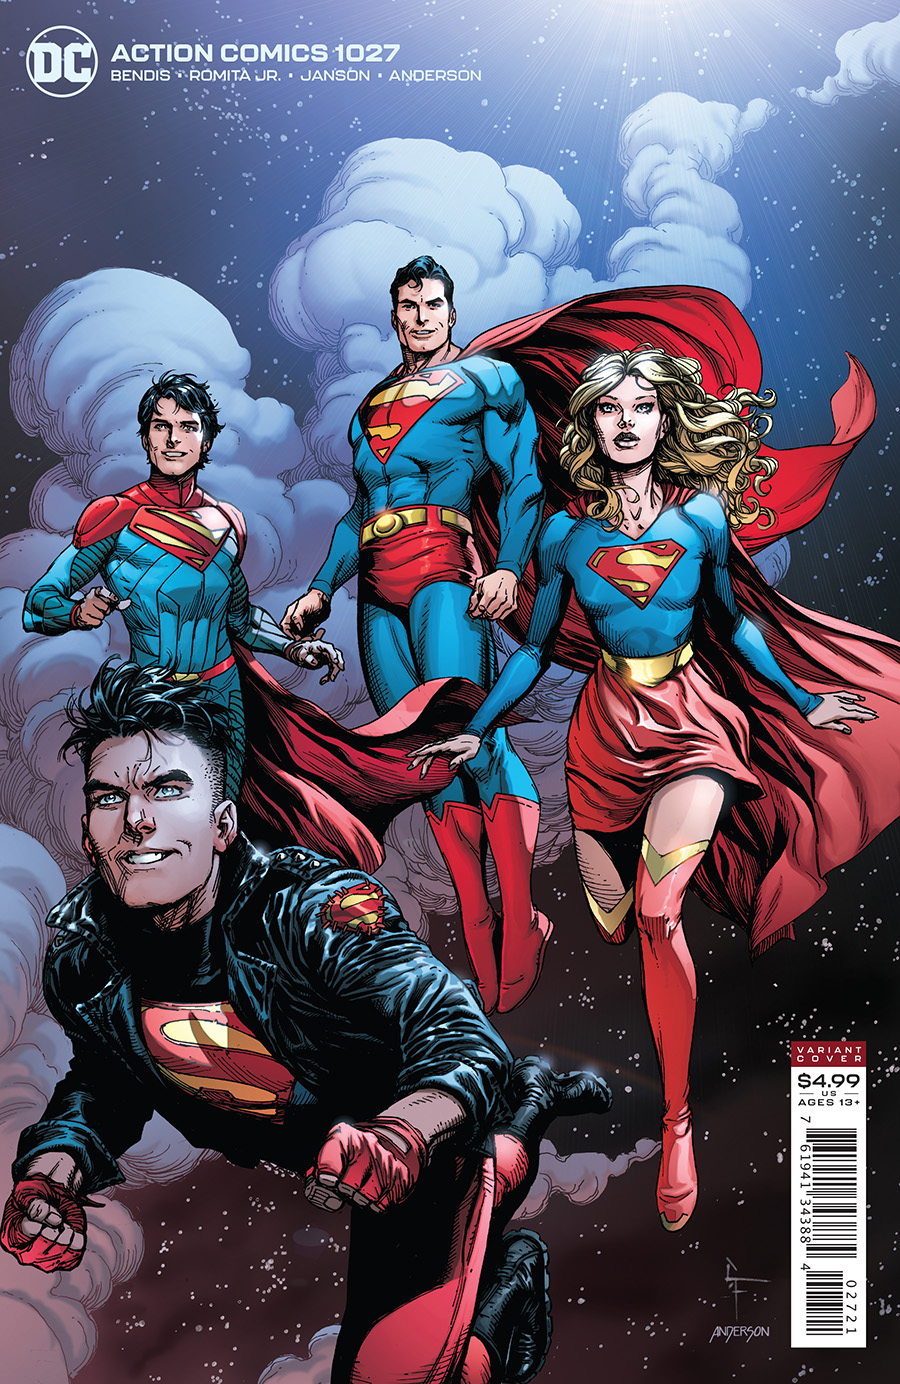 Action Comics Vol 1 #1027 Cover B Gary Frank Card Stock Variant